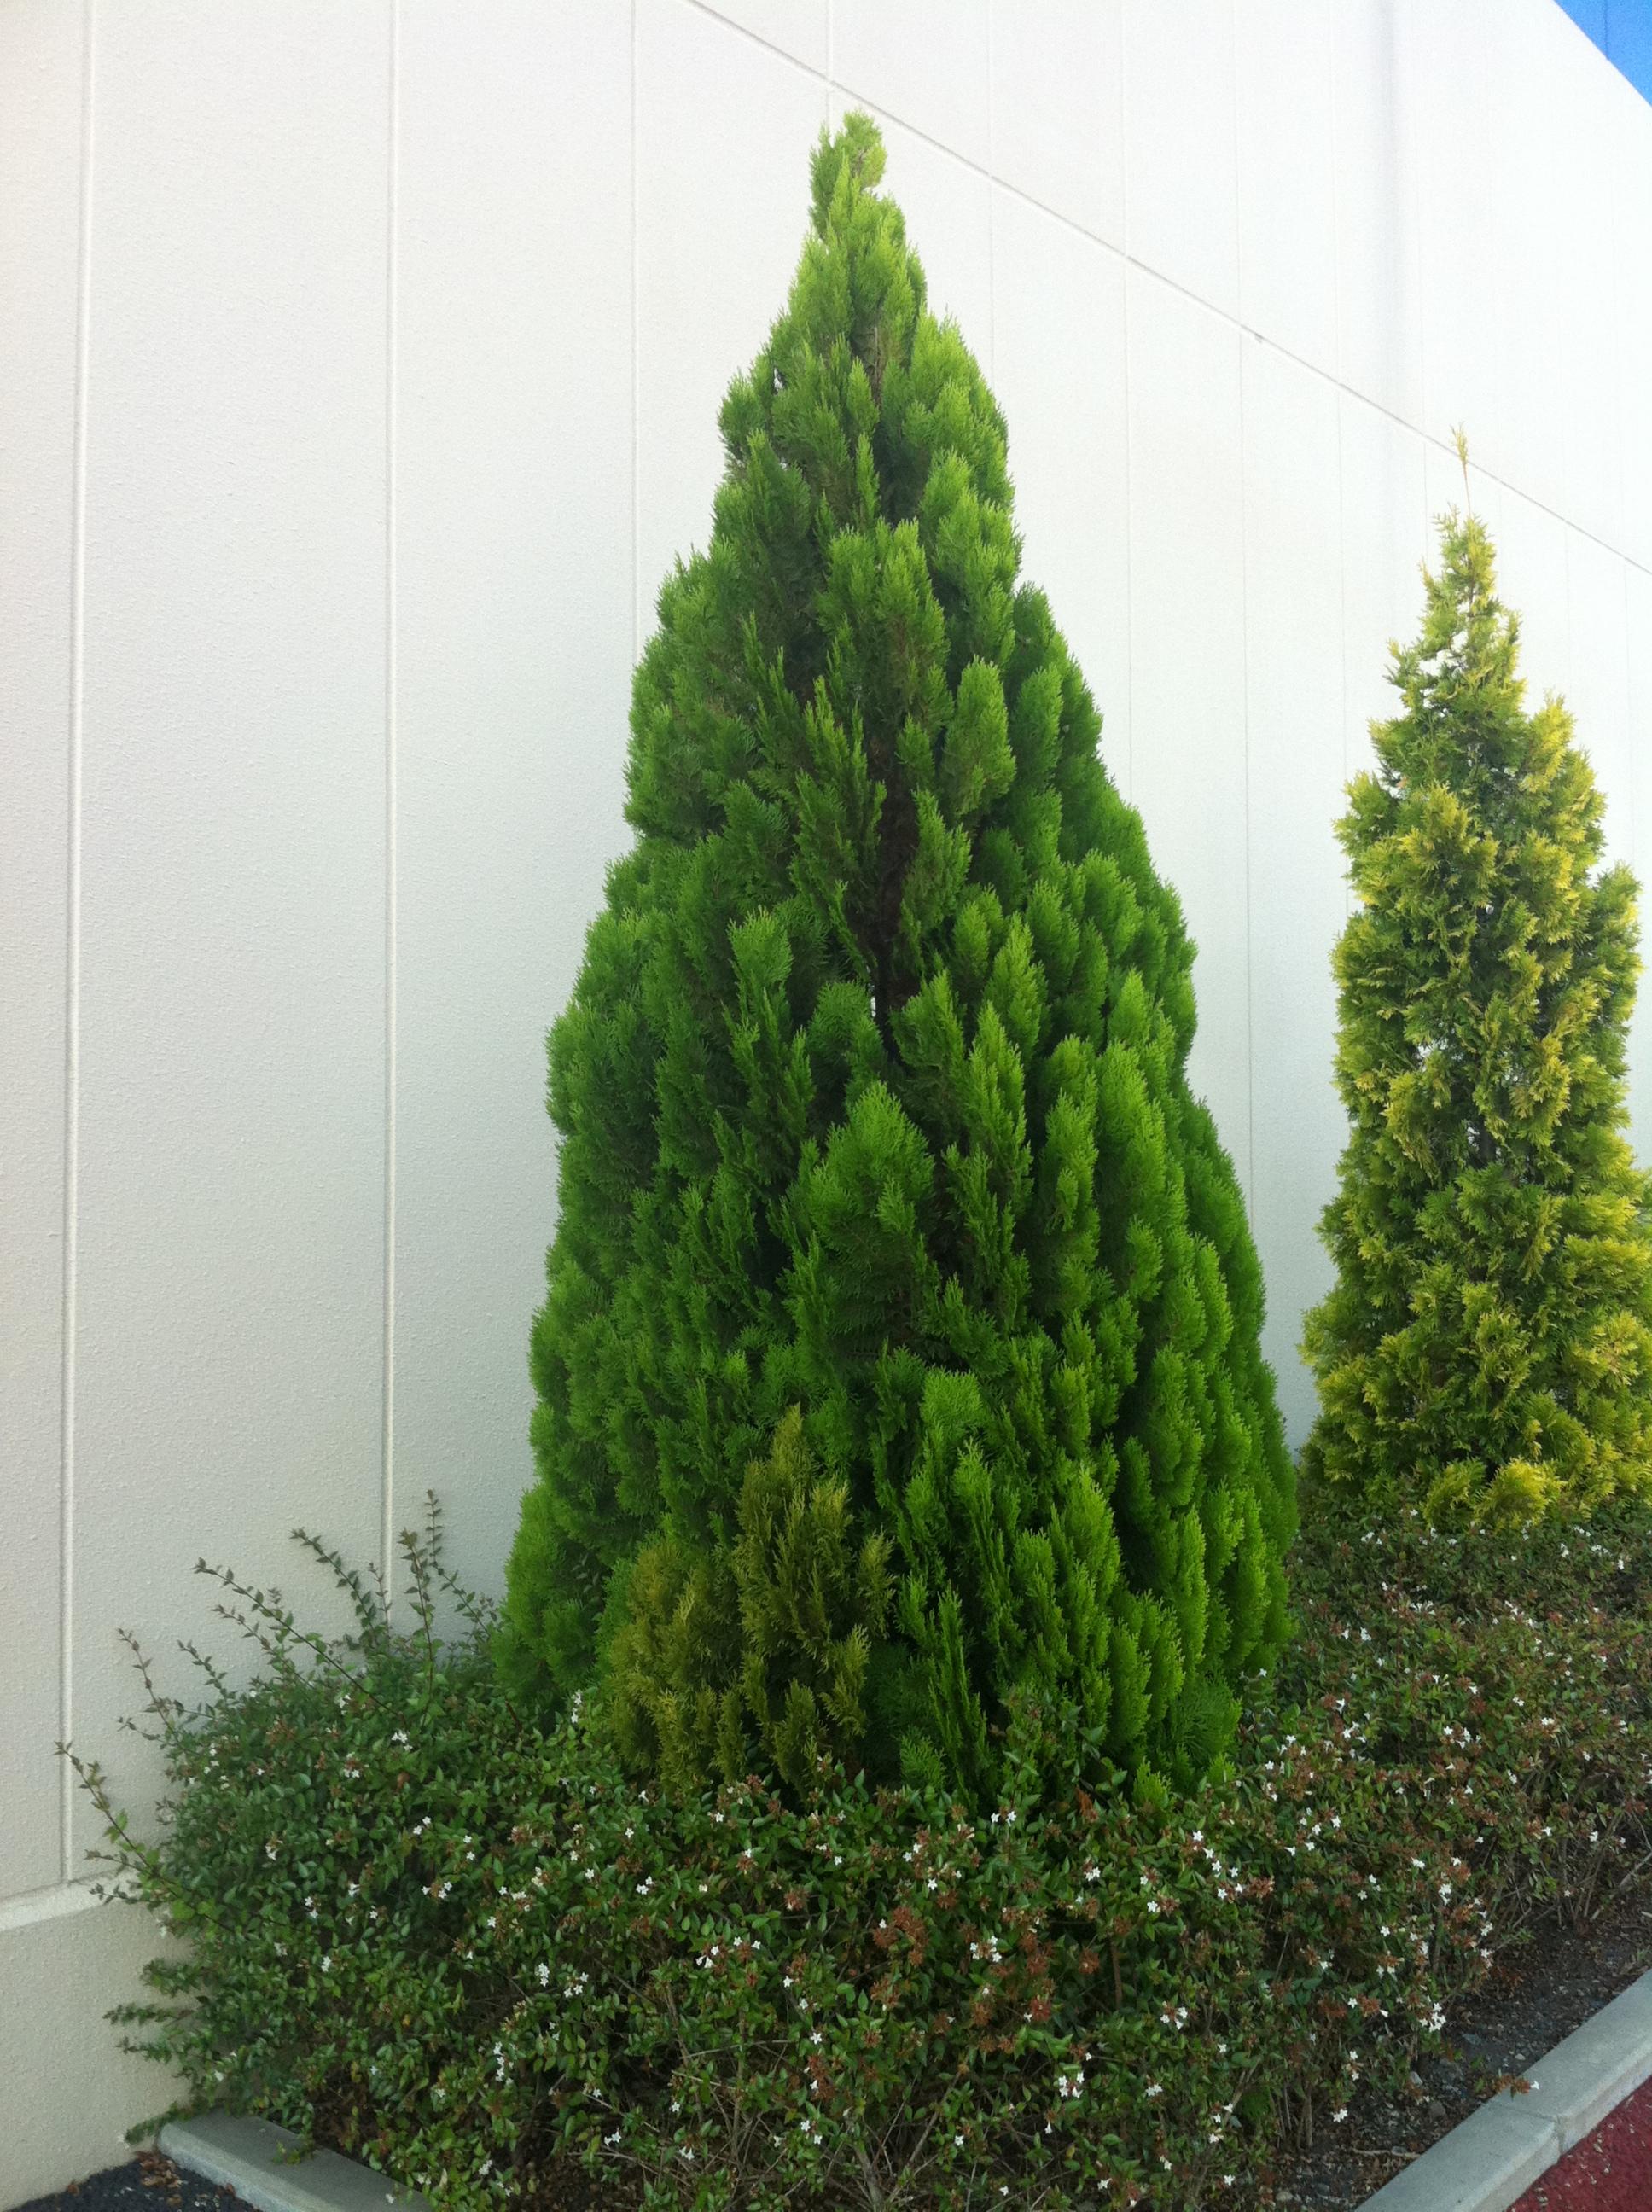 Garden Tree, Garden, Japanese, Tree, HQ Photo